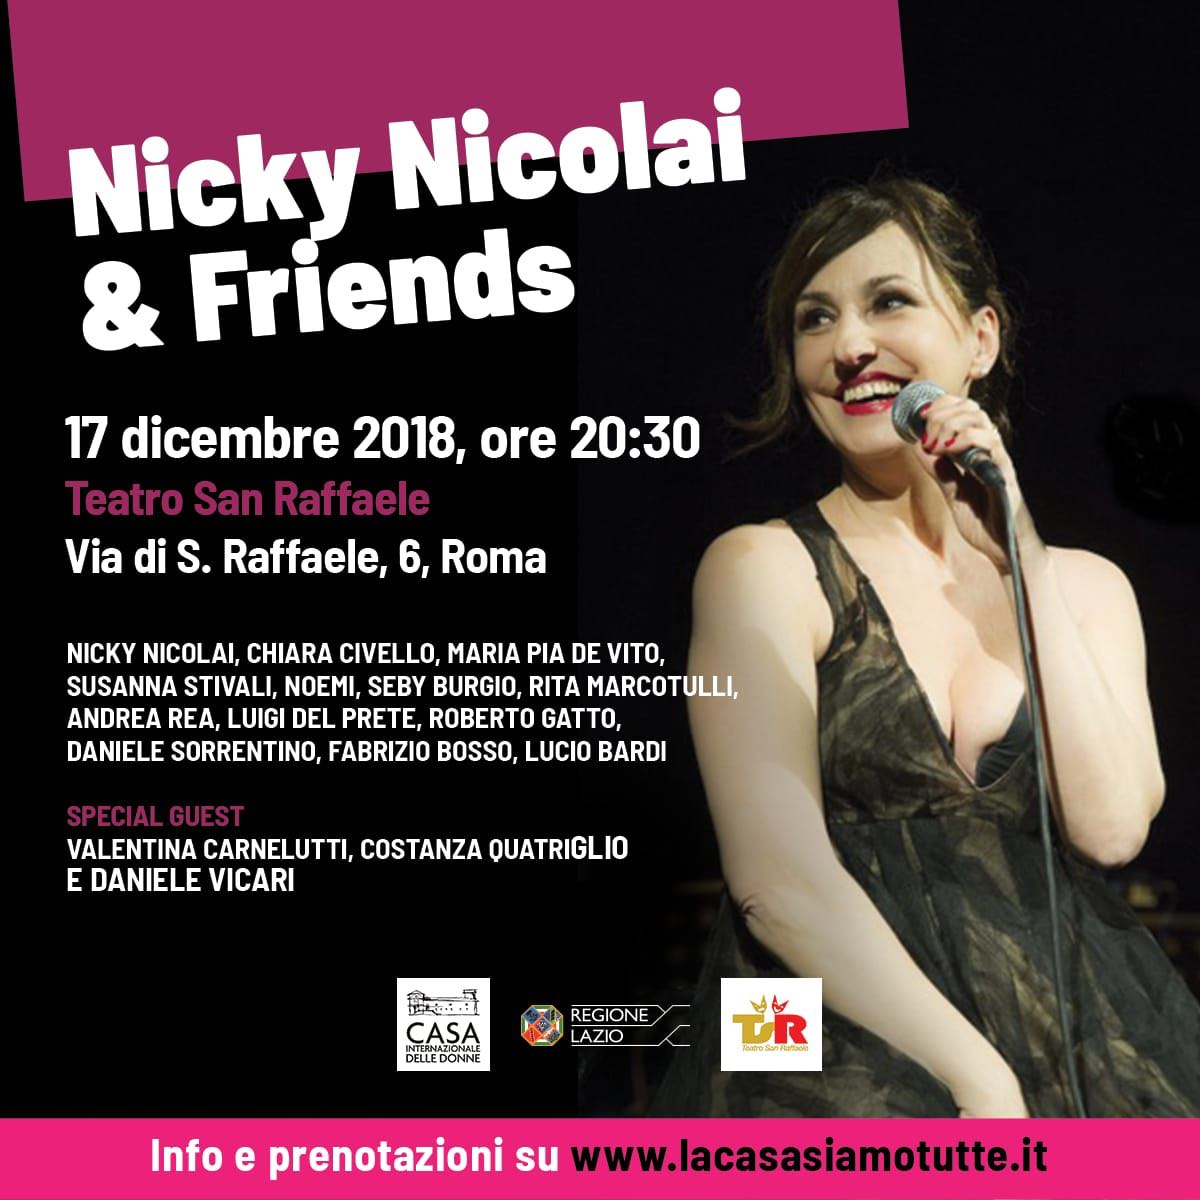 Nicky Nicolai & Friends - 17 dicembre 2018, 20:30 - Teatro San Raffaele Via di S. Raffaele, 6, Roma